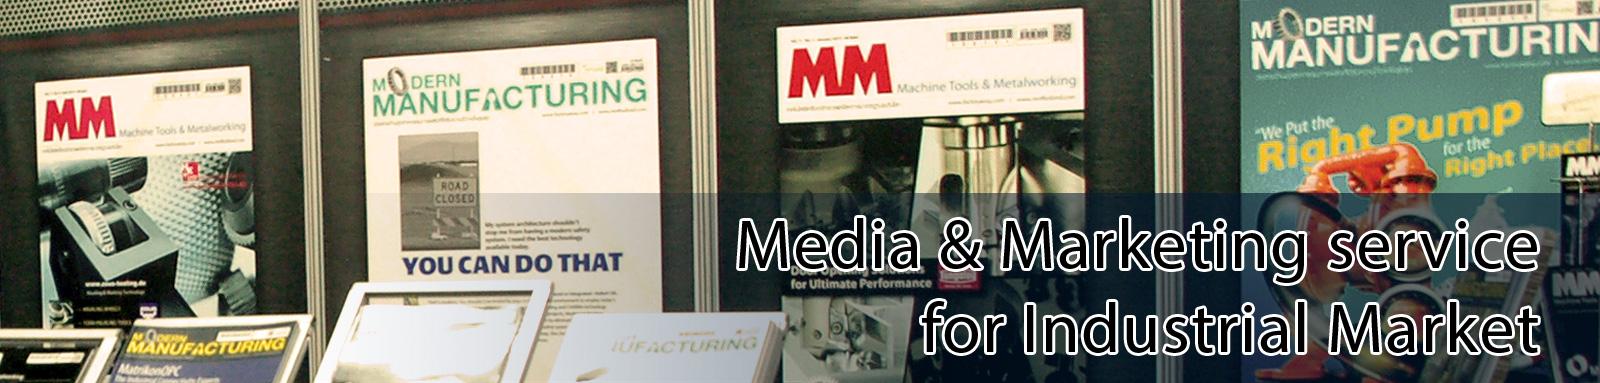 Media & Marketing service for Industrial Market